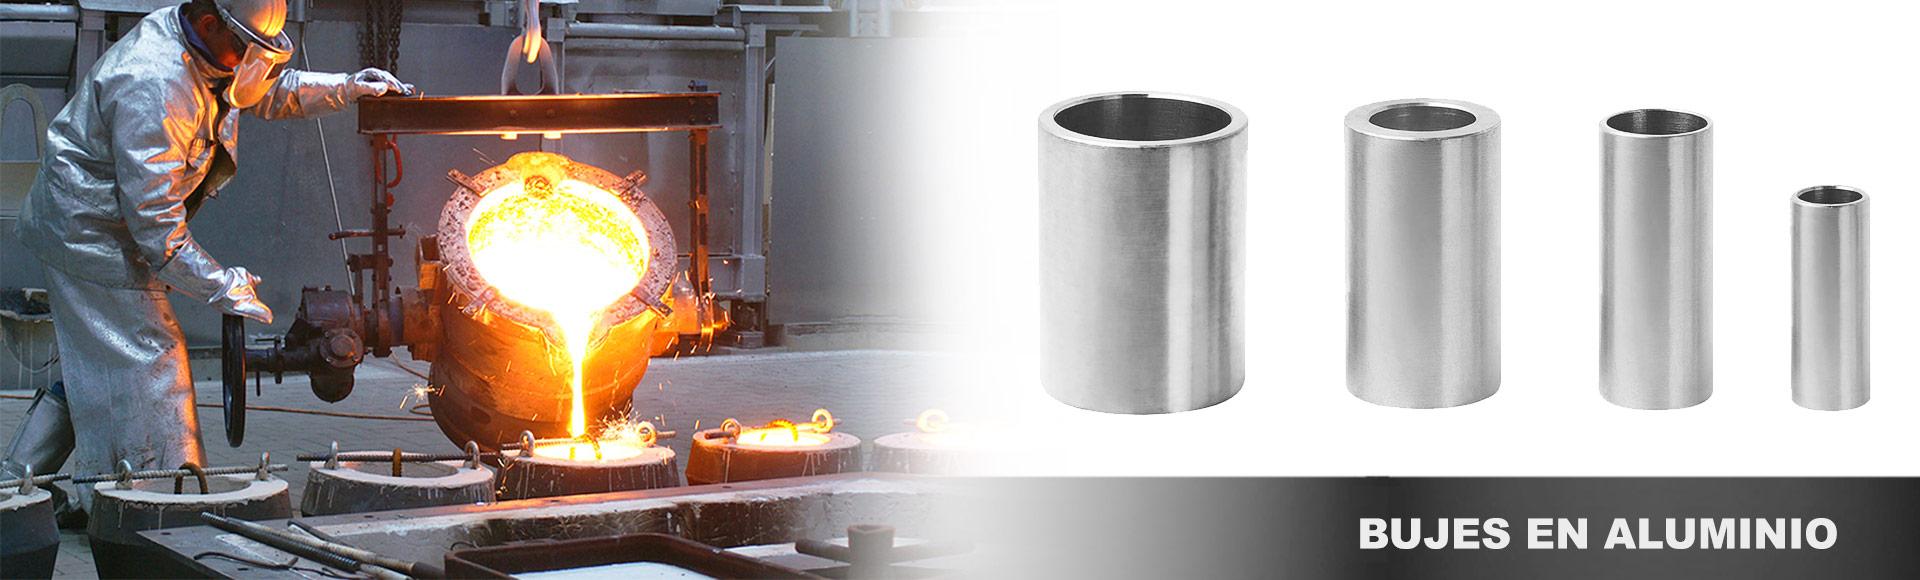 aluminio-bujes